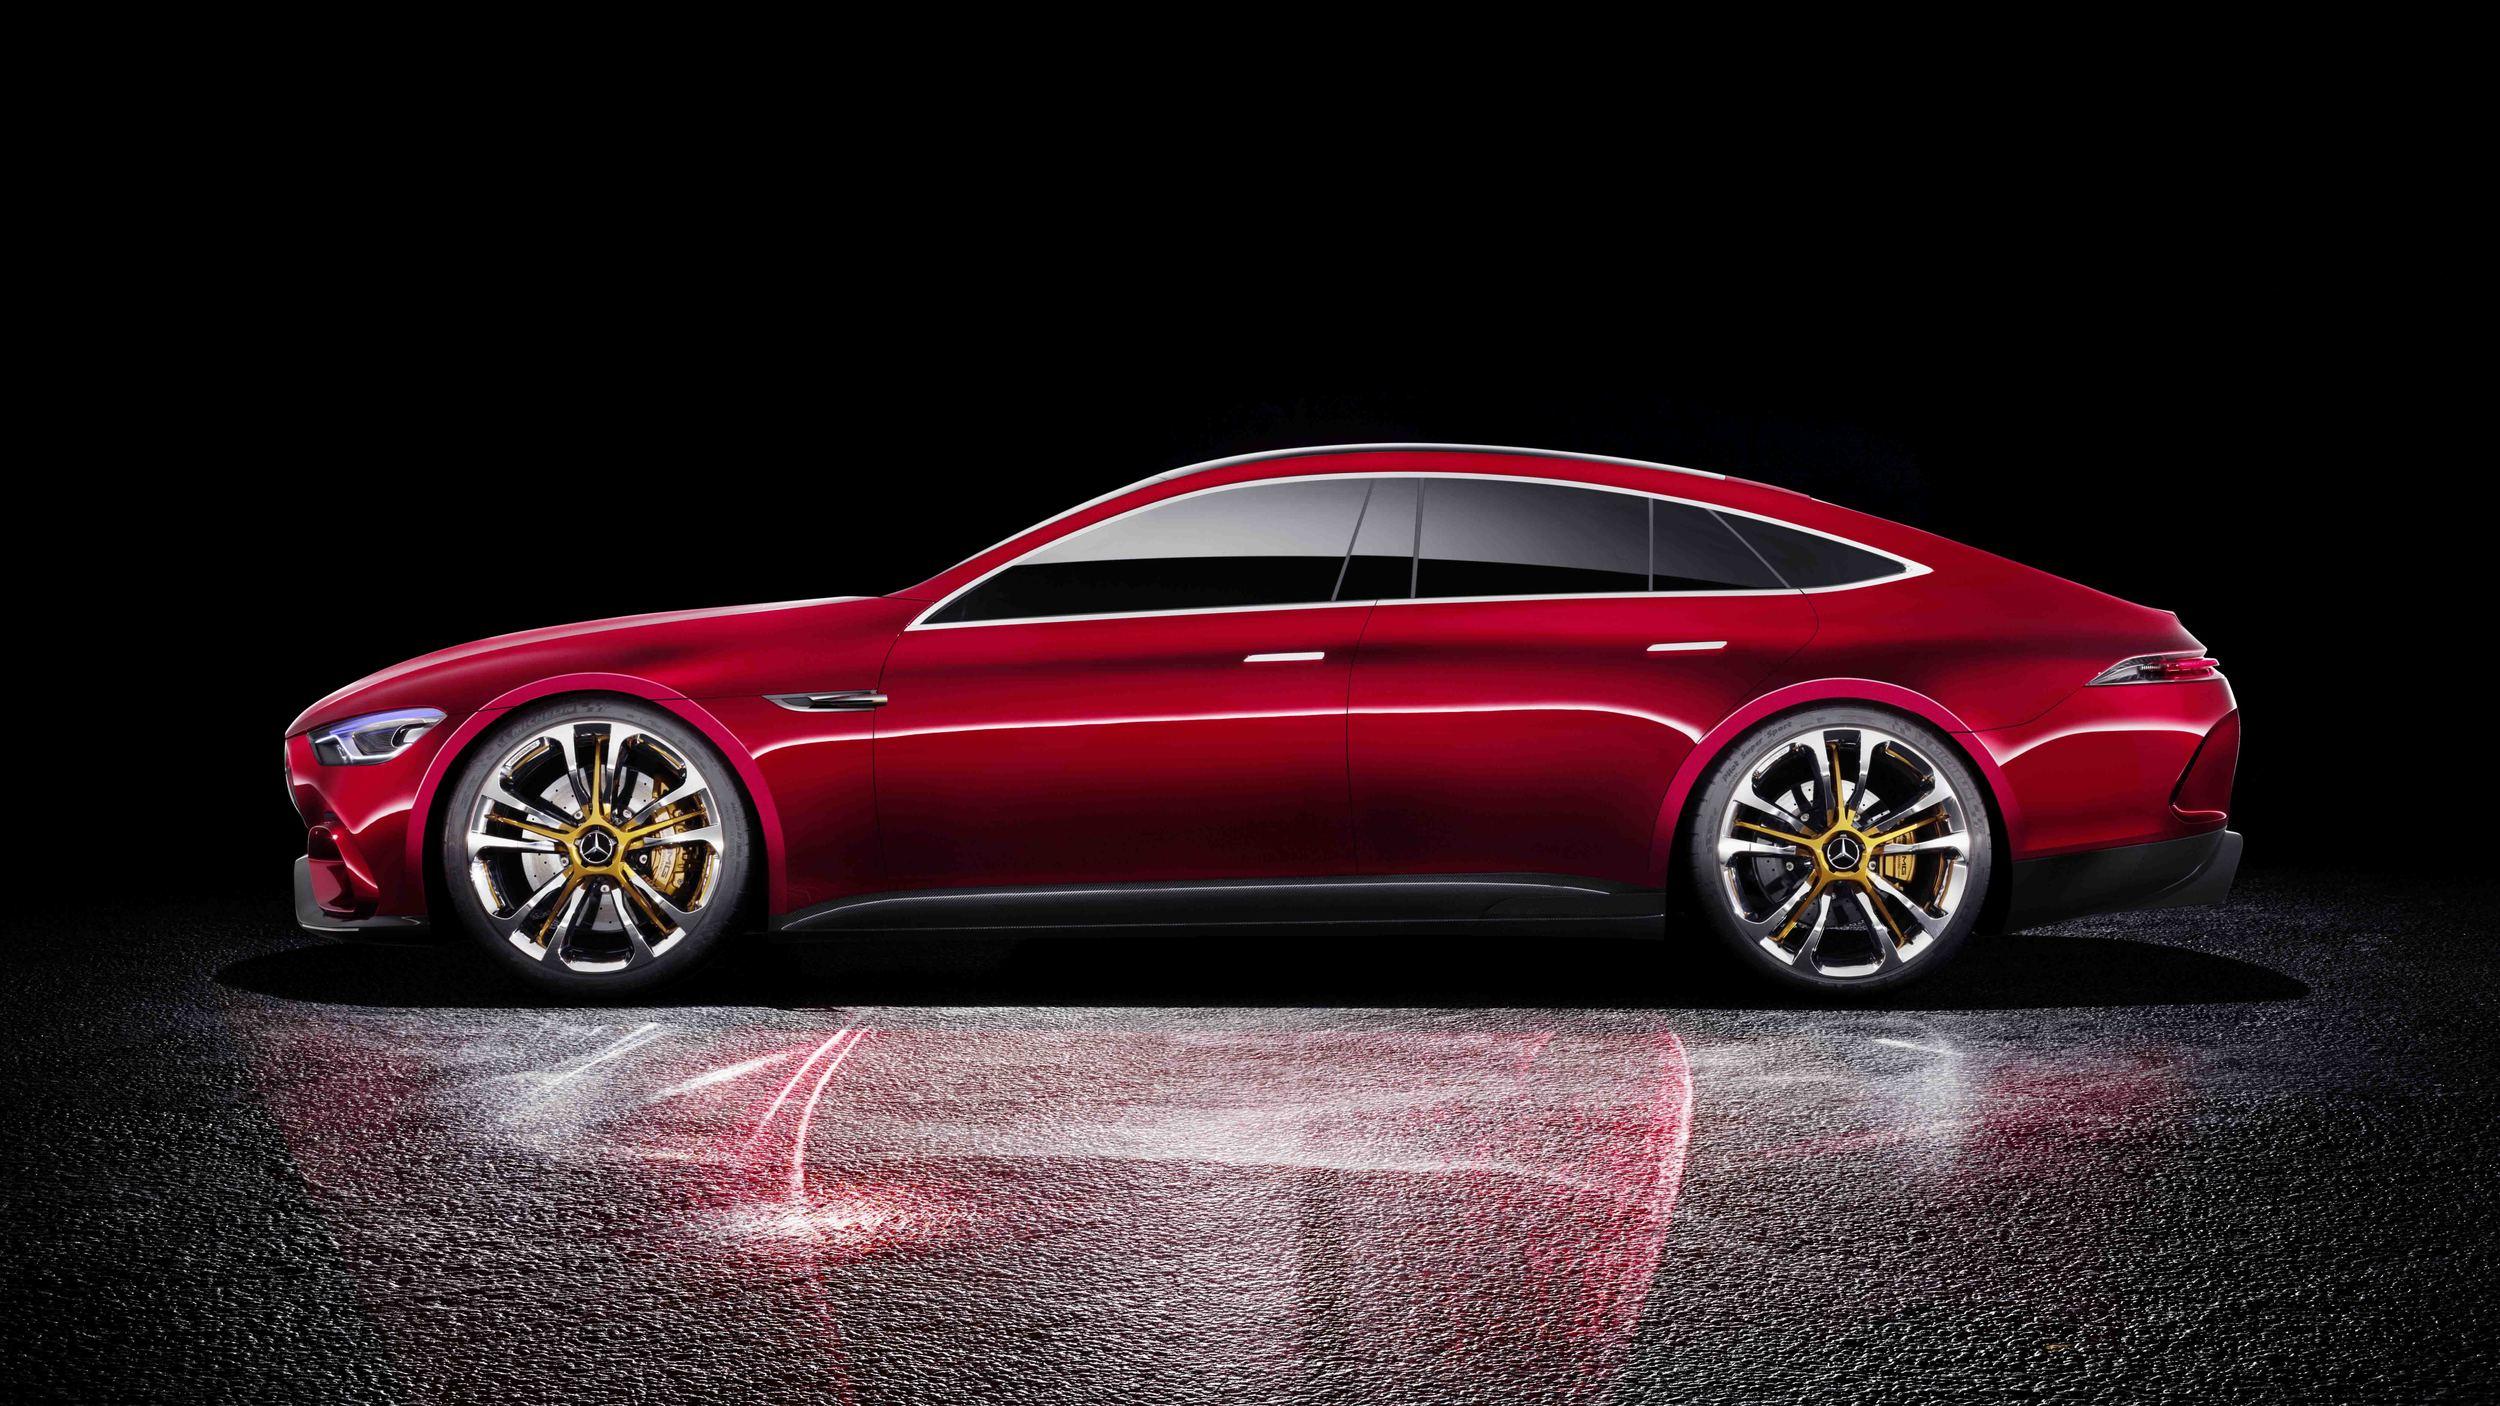 2017 mercedes benz amg gt concepts for Mercedes benz gts 2017